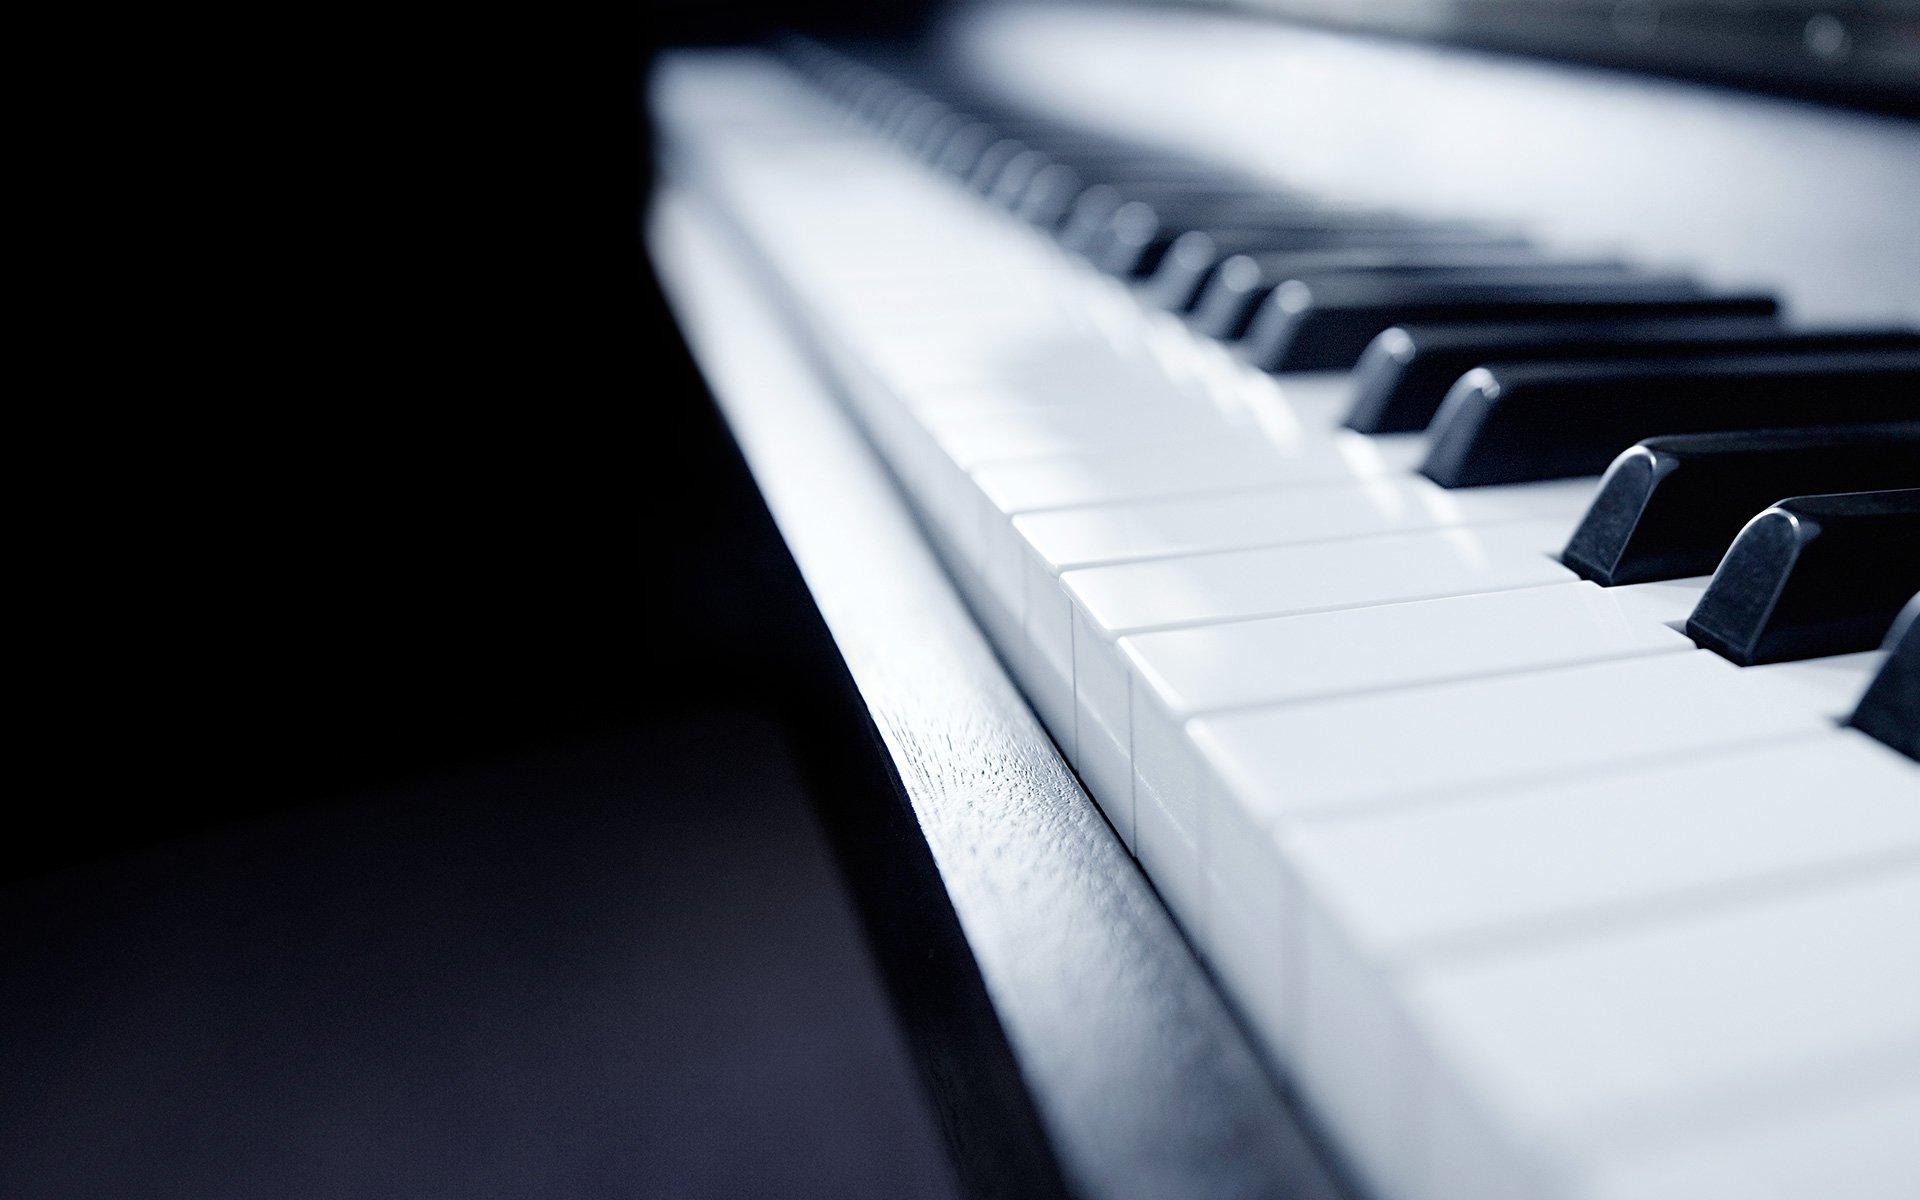 Piano Hd Wallpaper